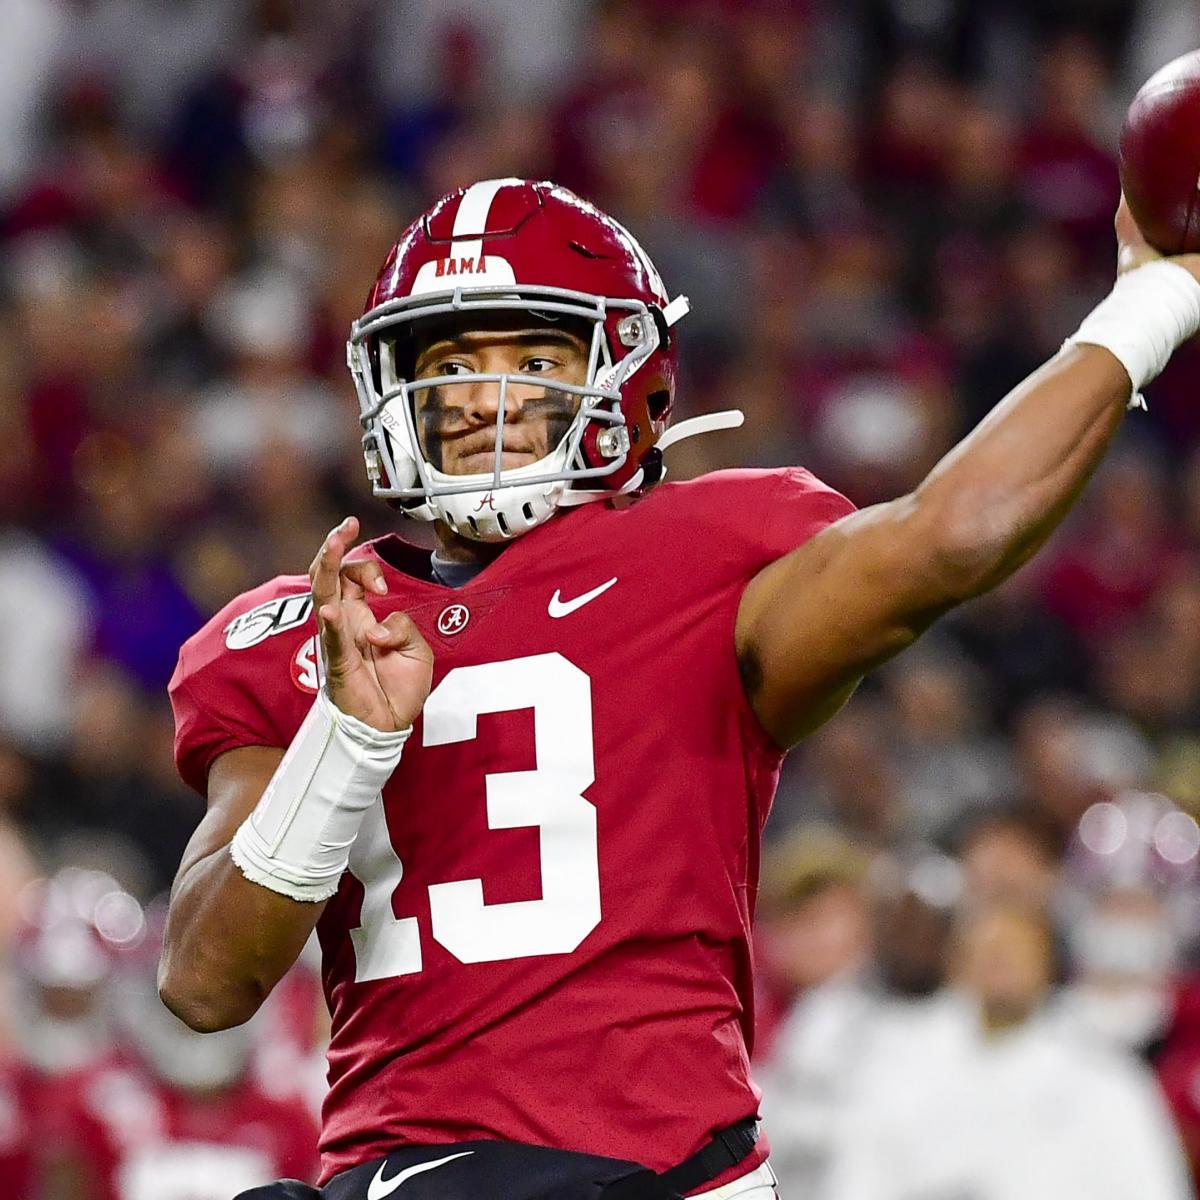 Tua Tagovailoa NFL Draft Odds: Lions, Dolphins Favored to Select Ex-Alabama QB